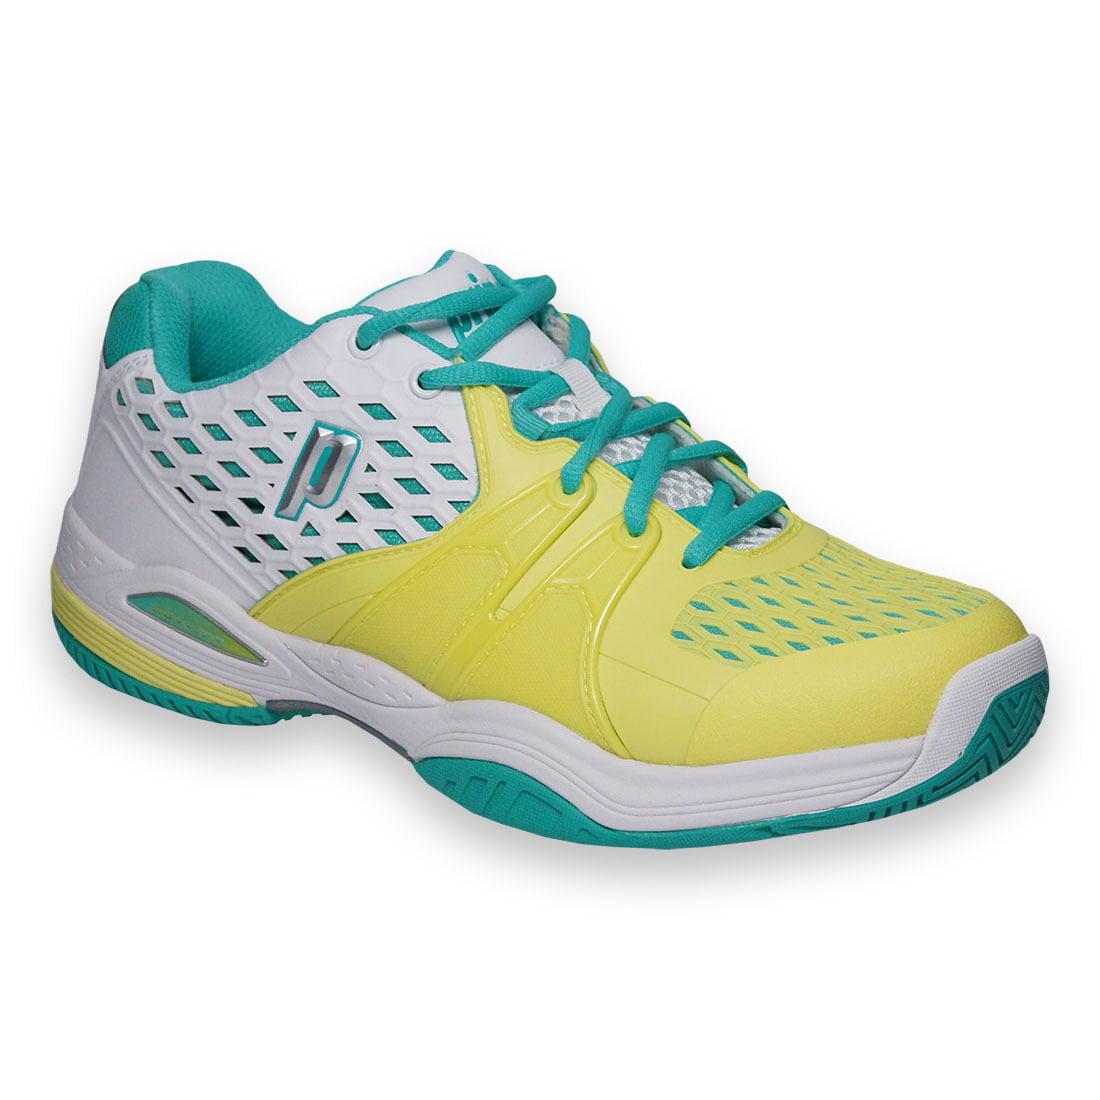 Prince  Warrior Women's Multicolored Mesh Tennis Shoe